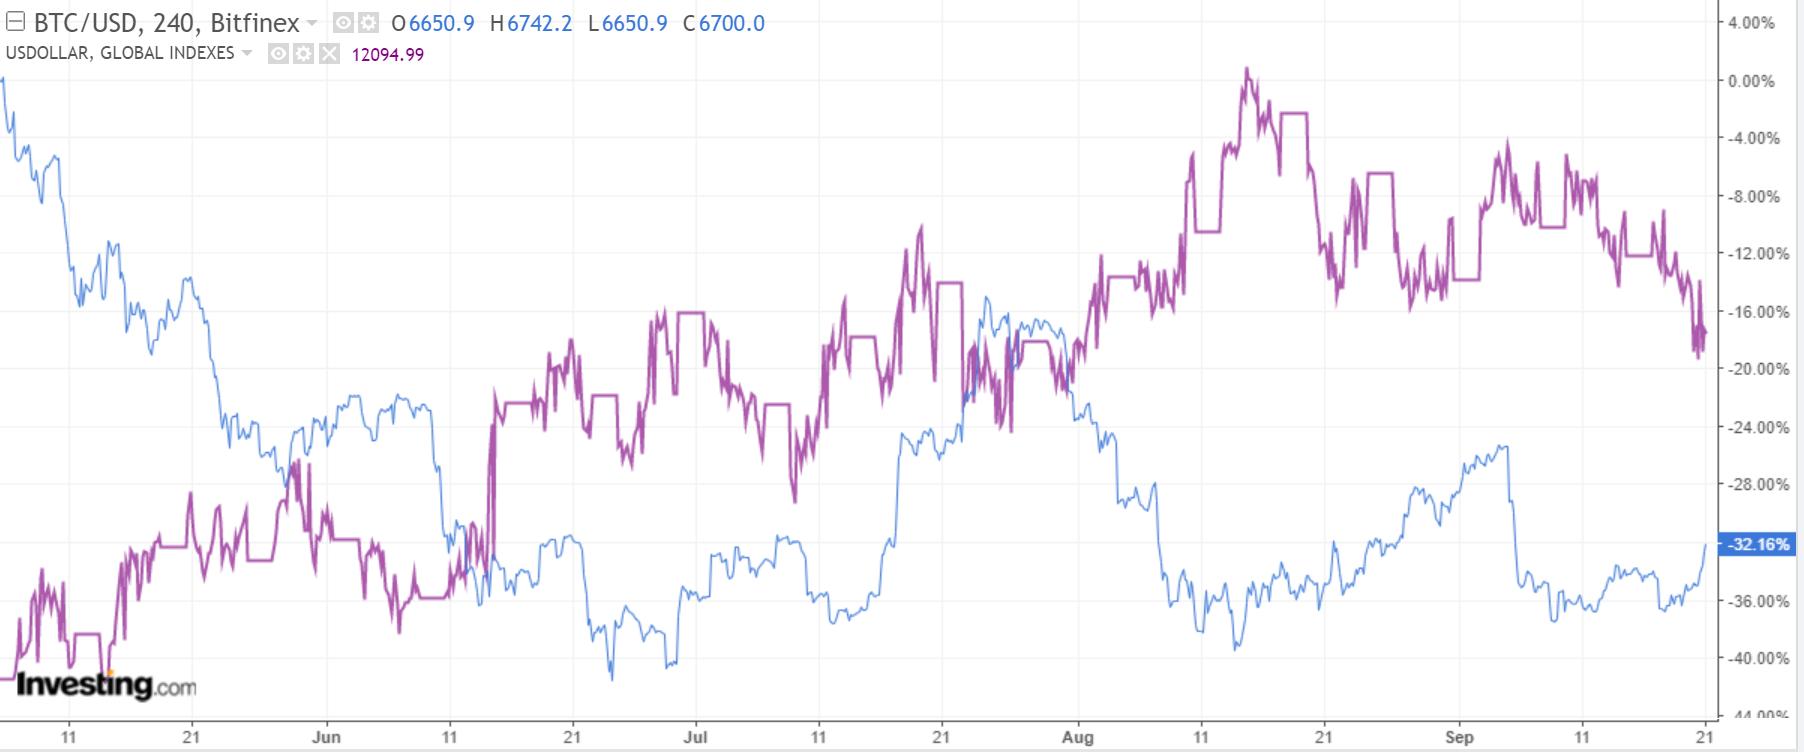 SEC, crypto, cryptocurrencies, market, trading, dollar, cannabis